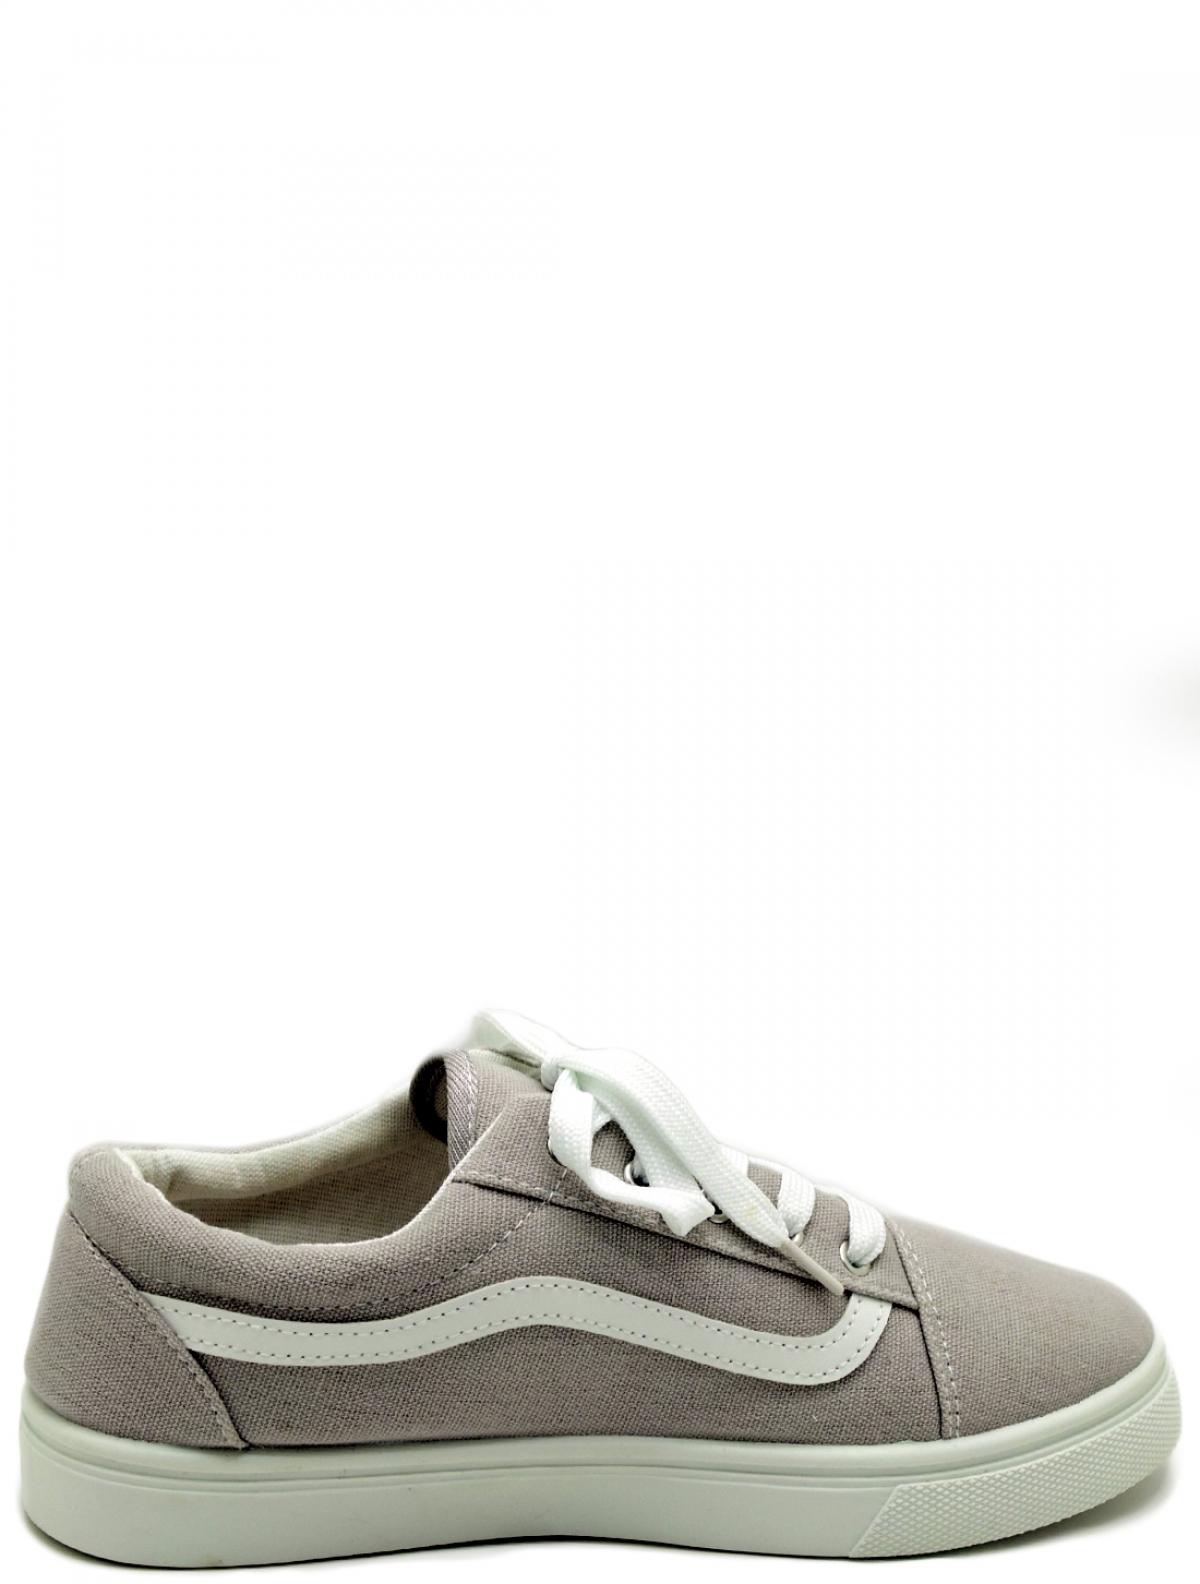 Torsion Field 914241-8 женские кроссовки